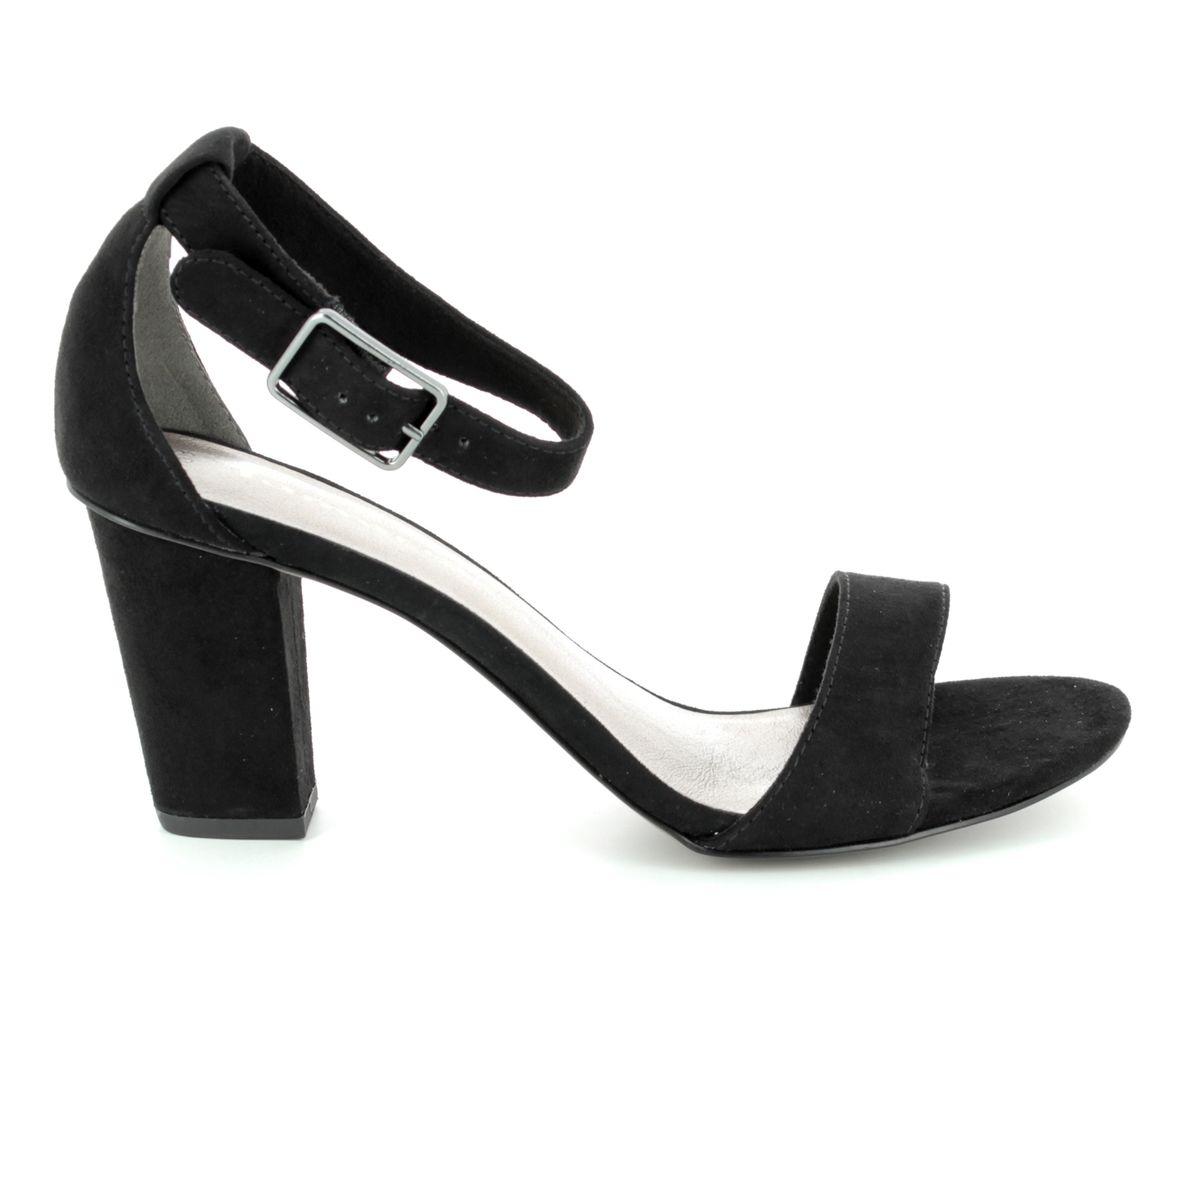 26a682e3a0aa Tamaris Heeled Sandals - Black - 28397 20 001 HEITI